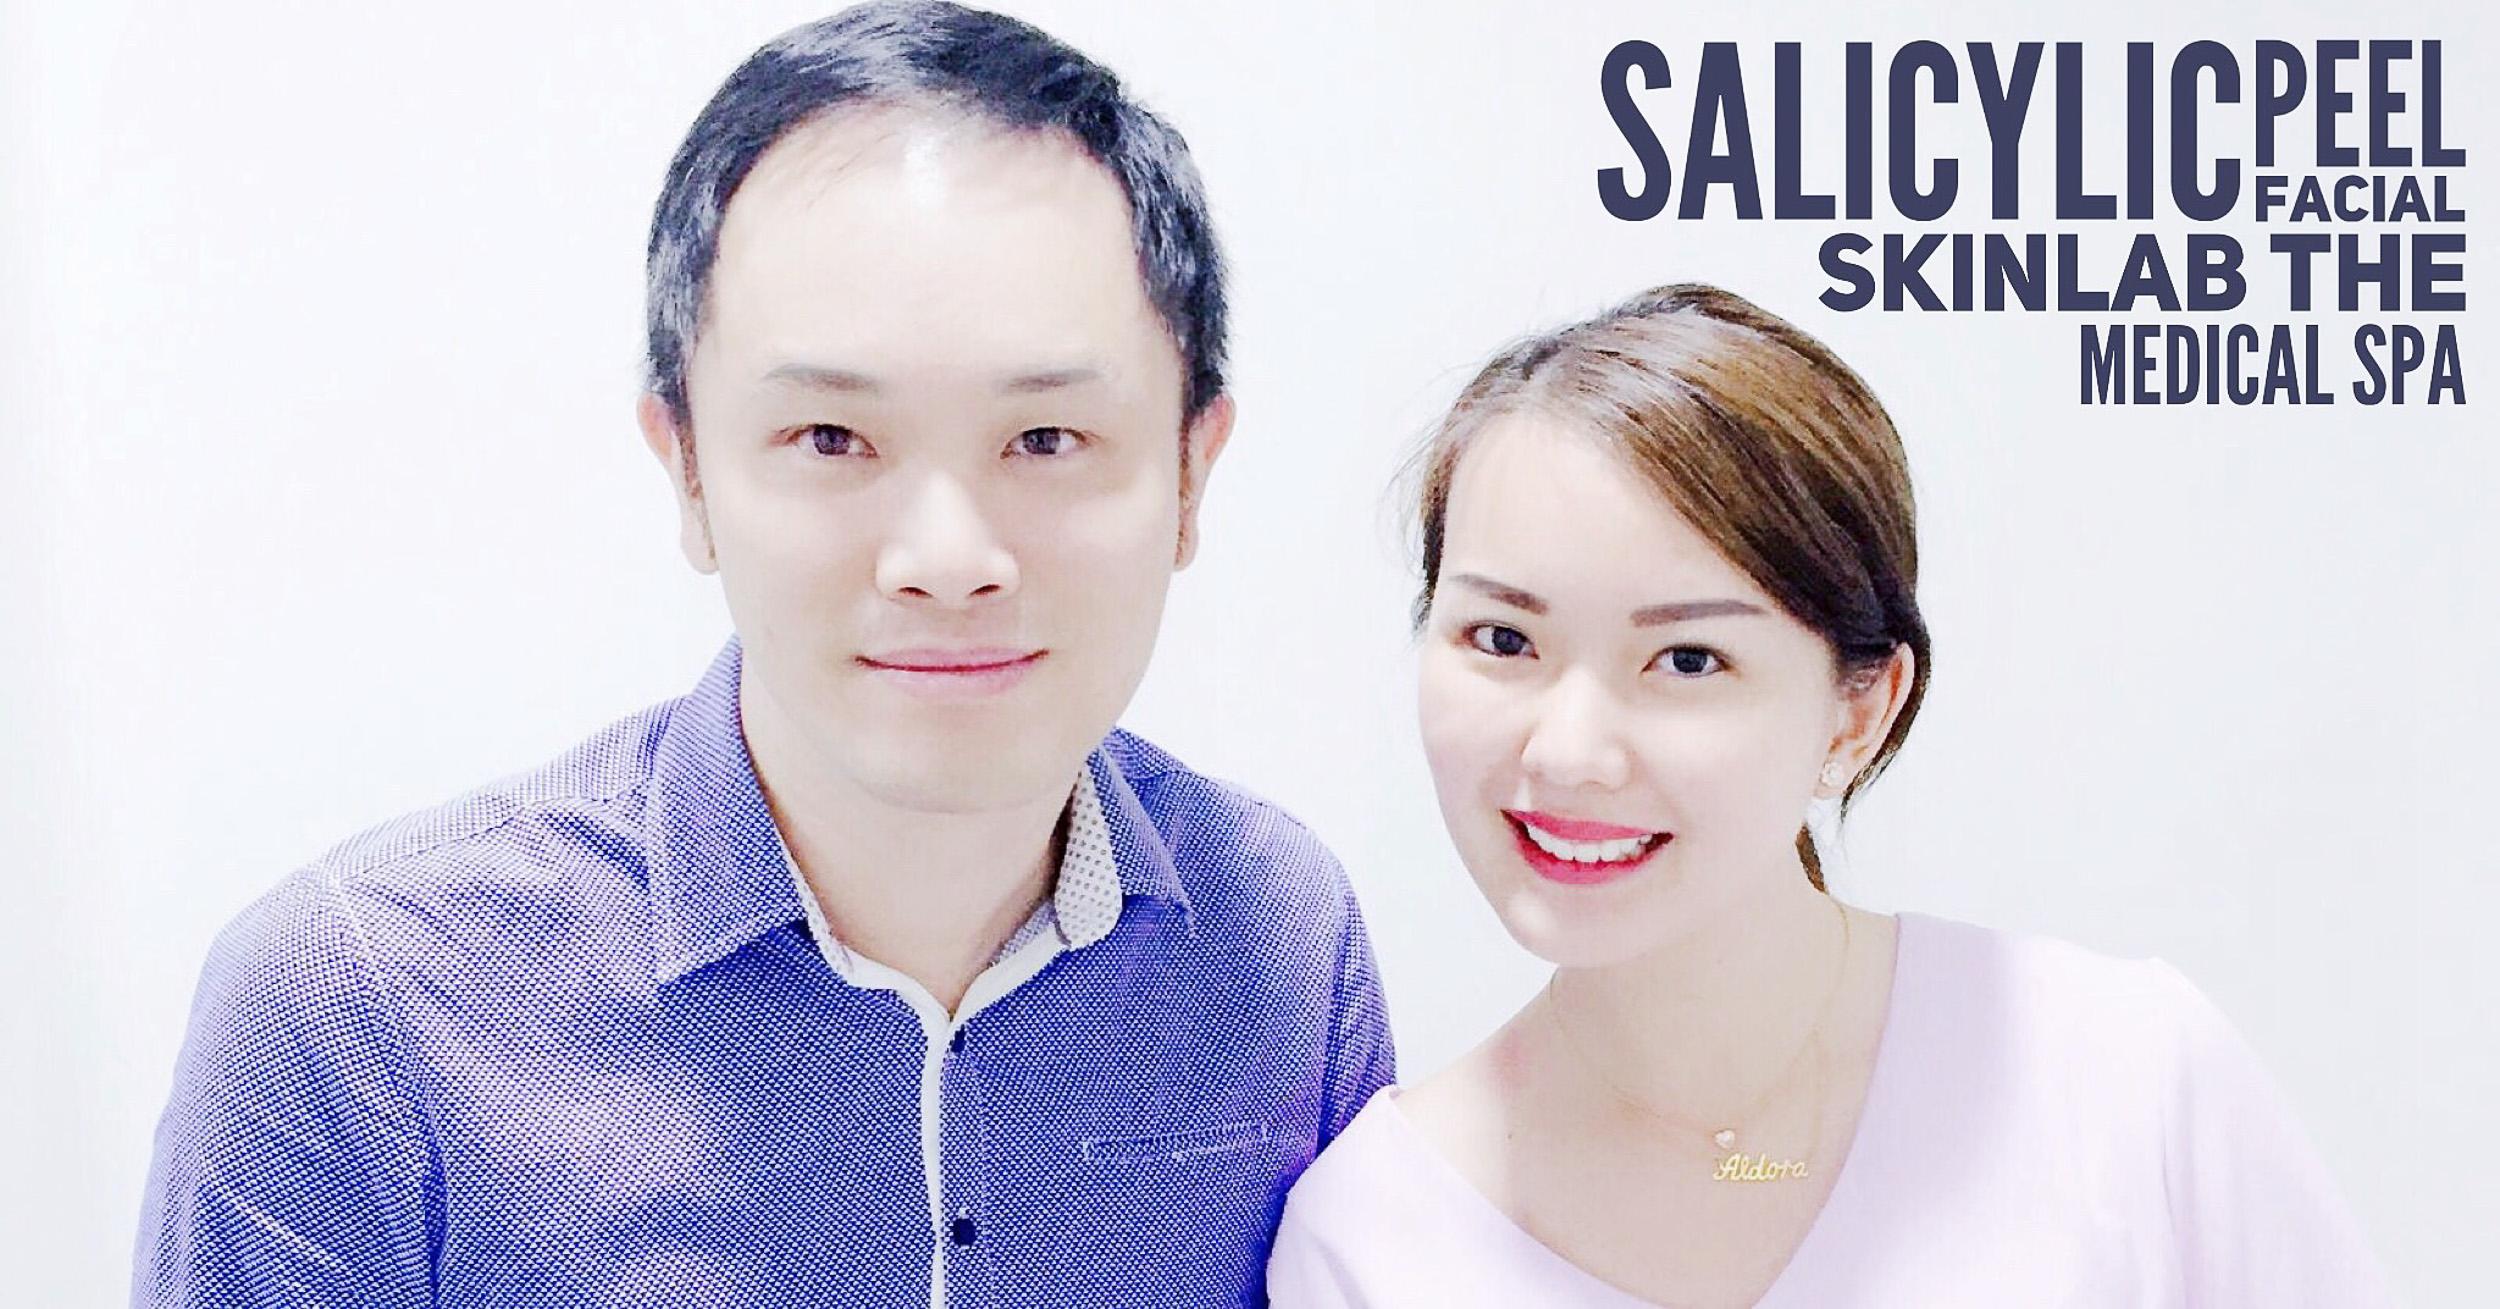 Salicylic Facial 100